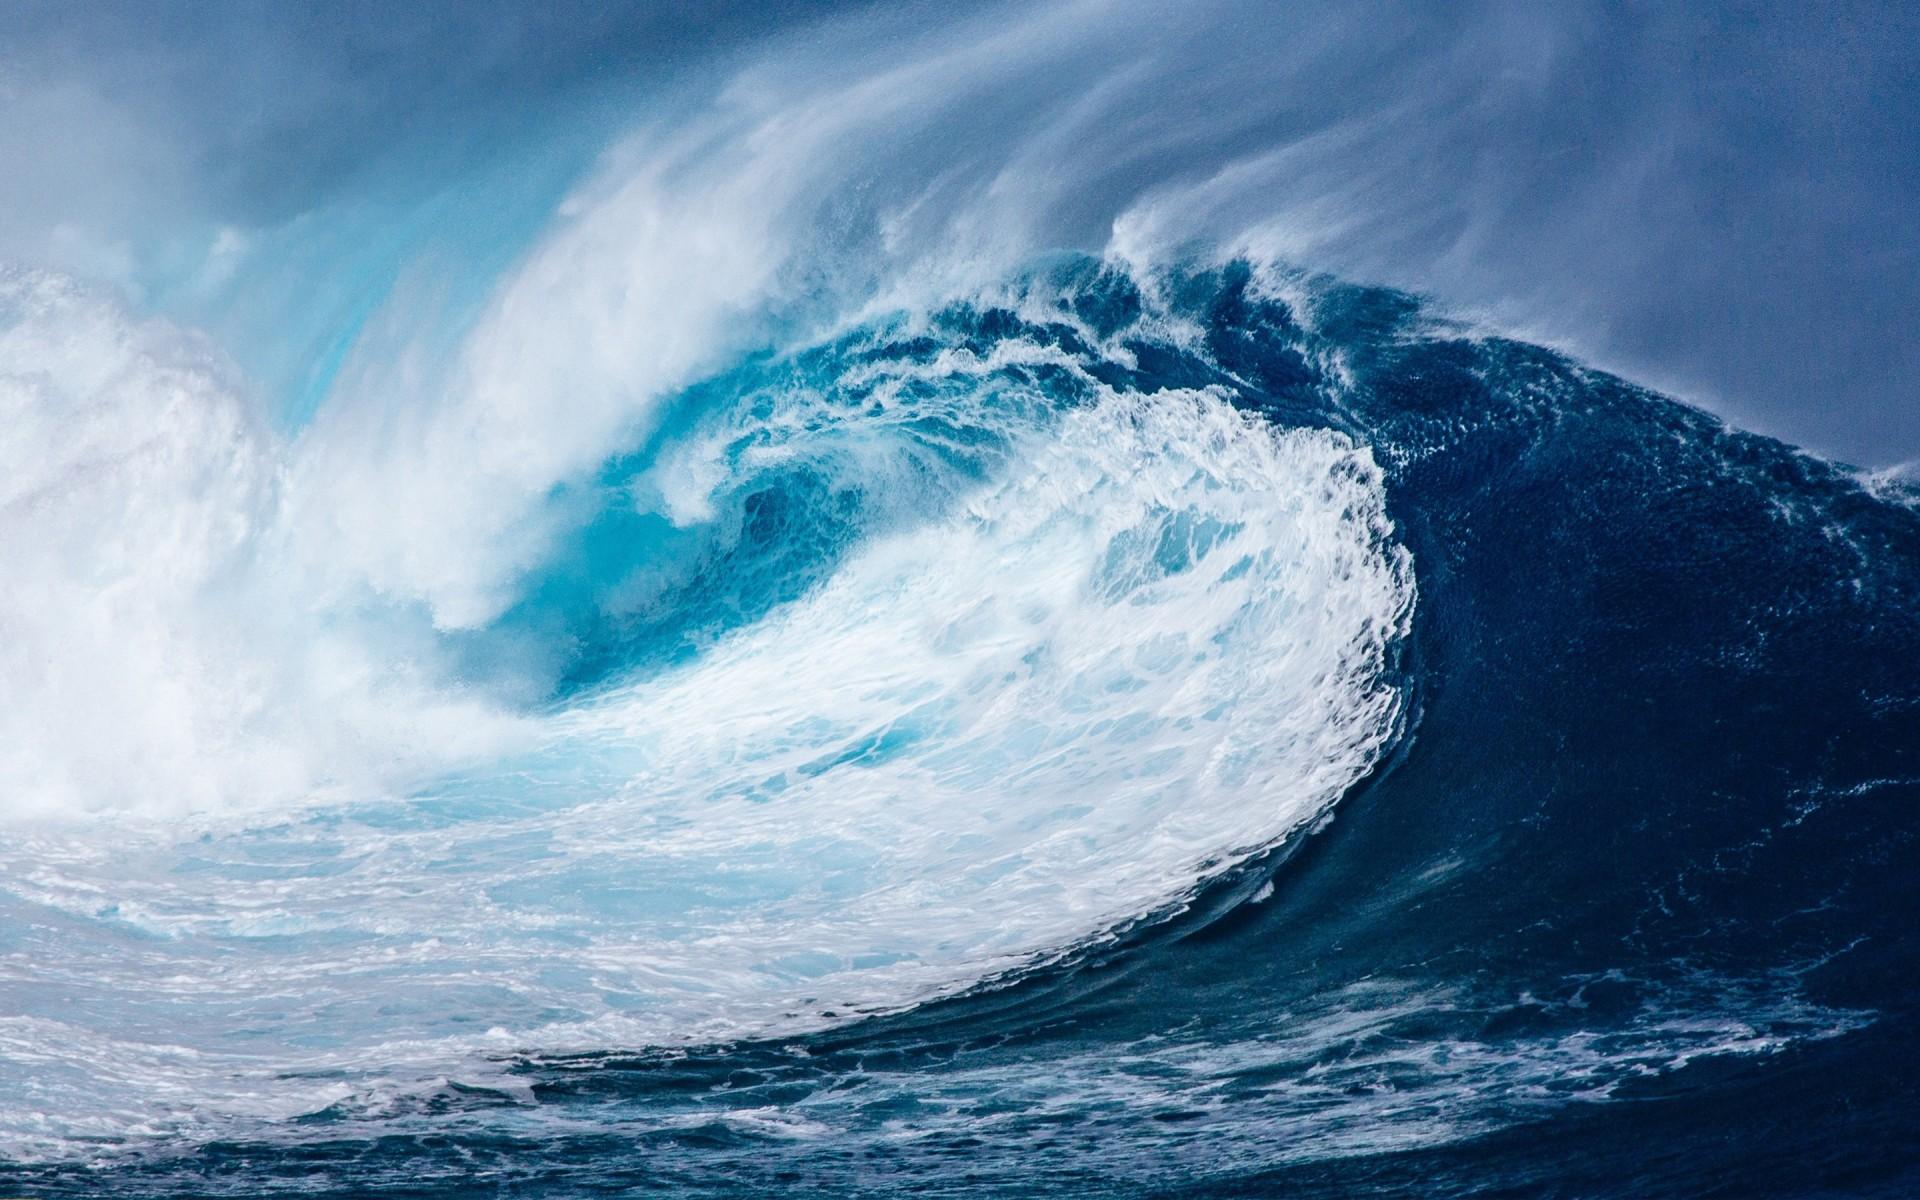 Japanese Wave Wallpaper Hd Tidal Waves Wallpapers Hd Wallpapers Id 19491